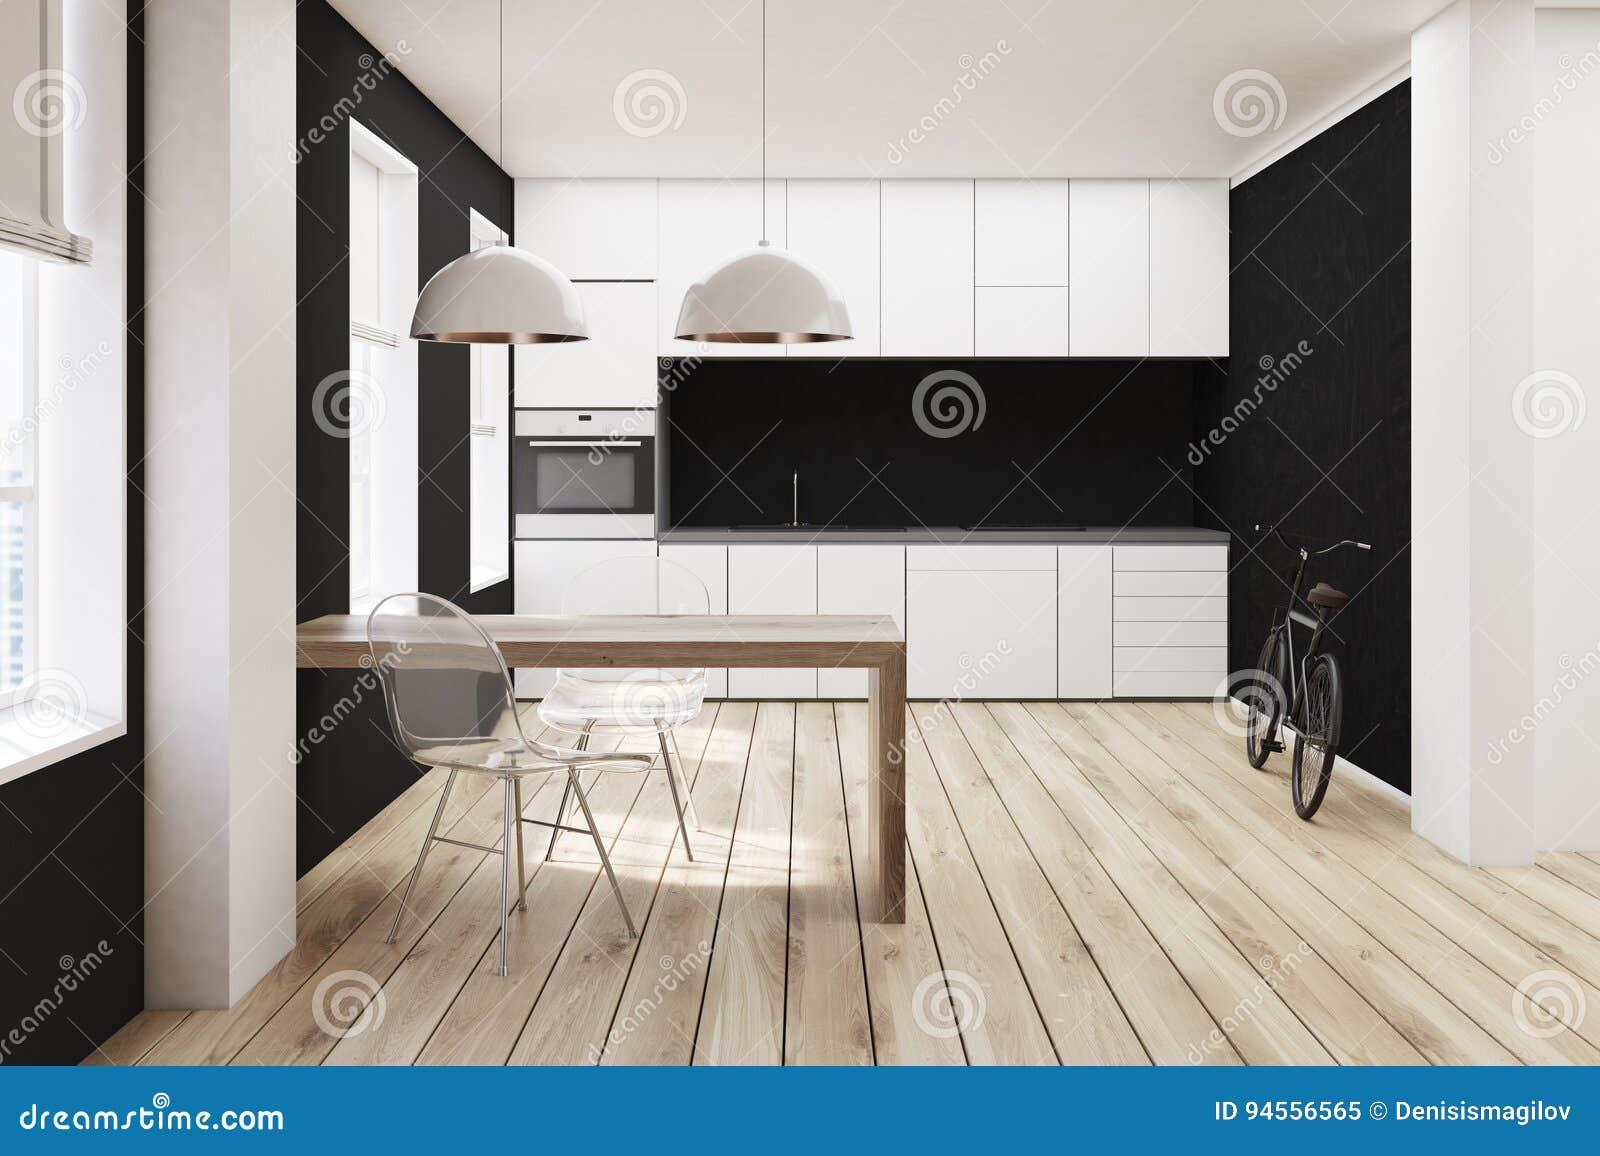 Witte en zwarte keuken houten vloer stock illustratie